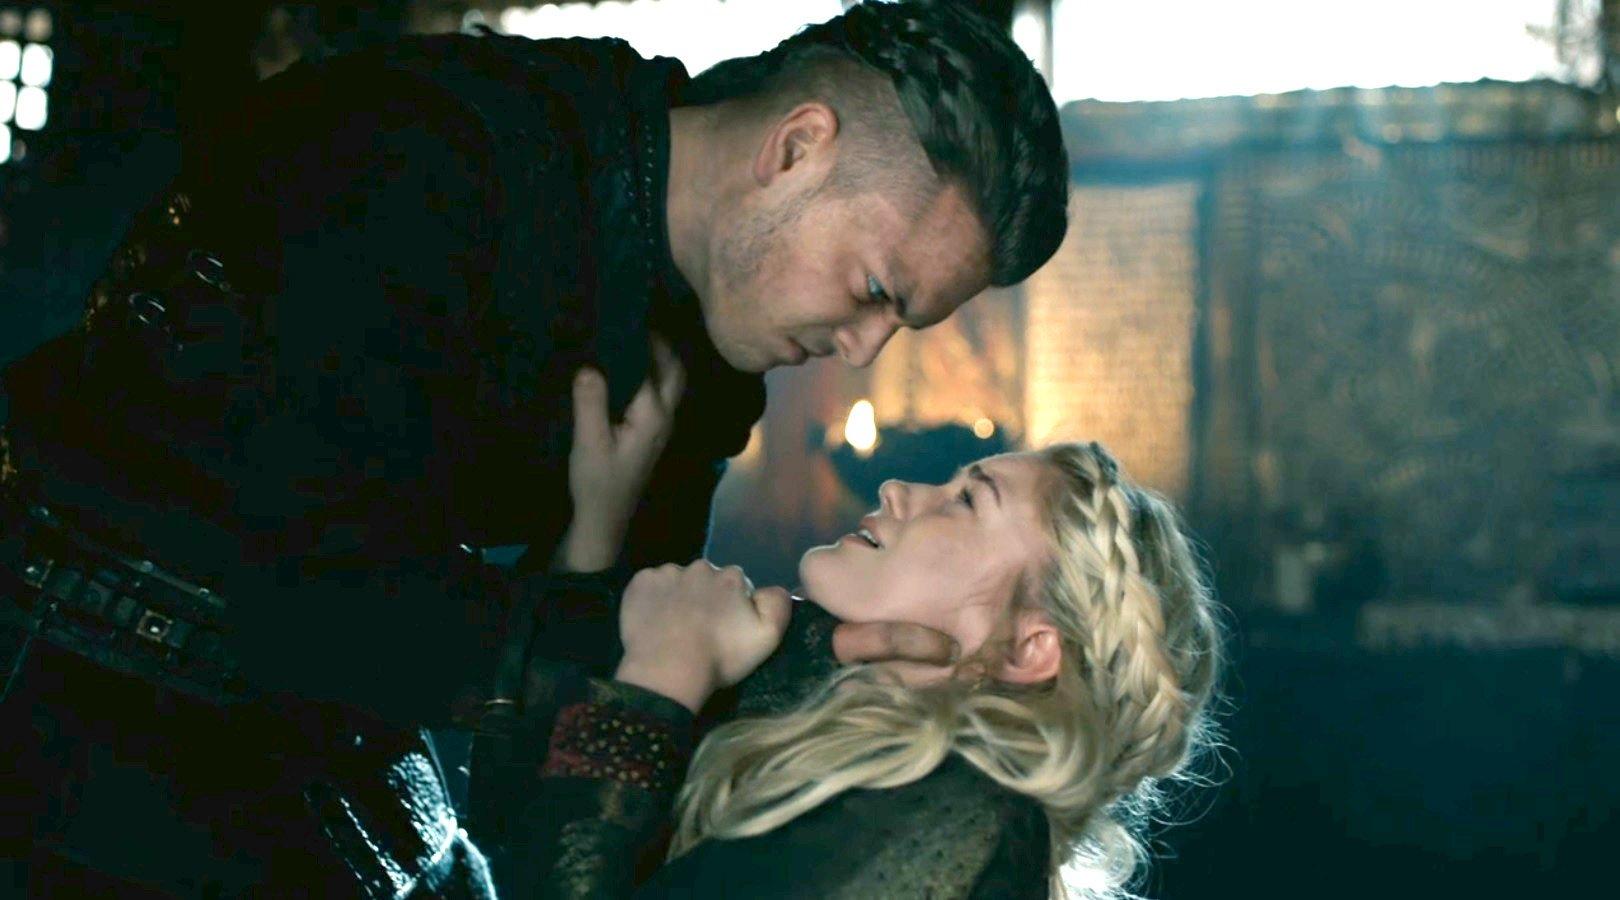 Vikings star Alicia Agneson really got strangled filming Freydis death scene